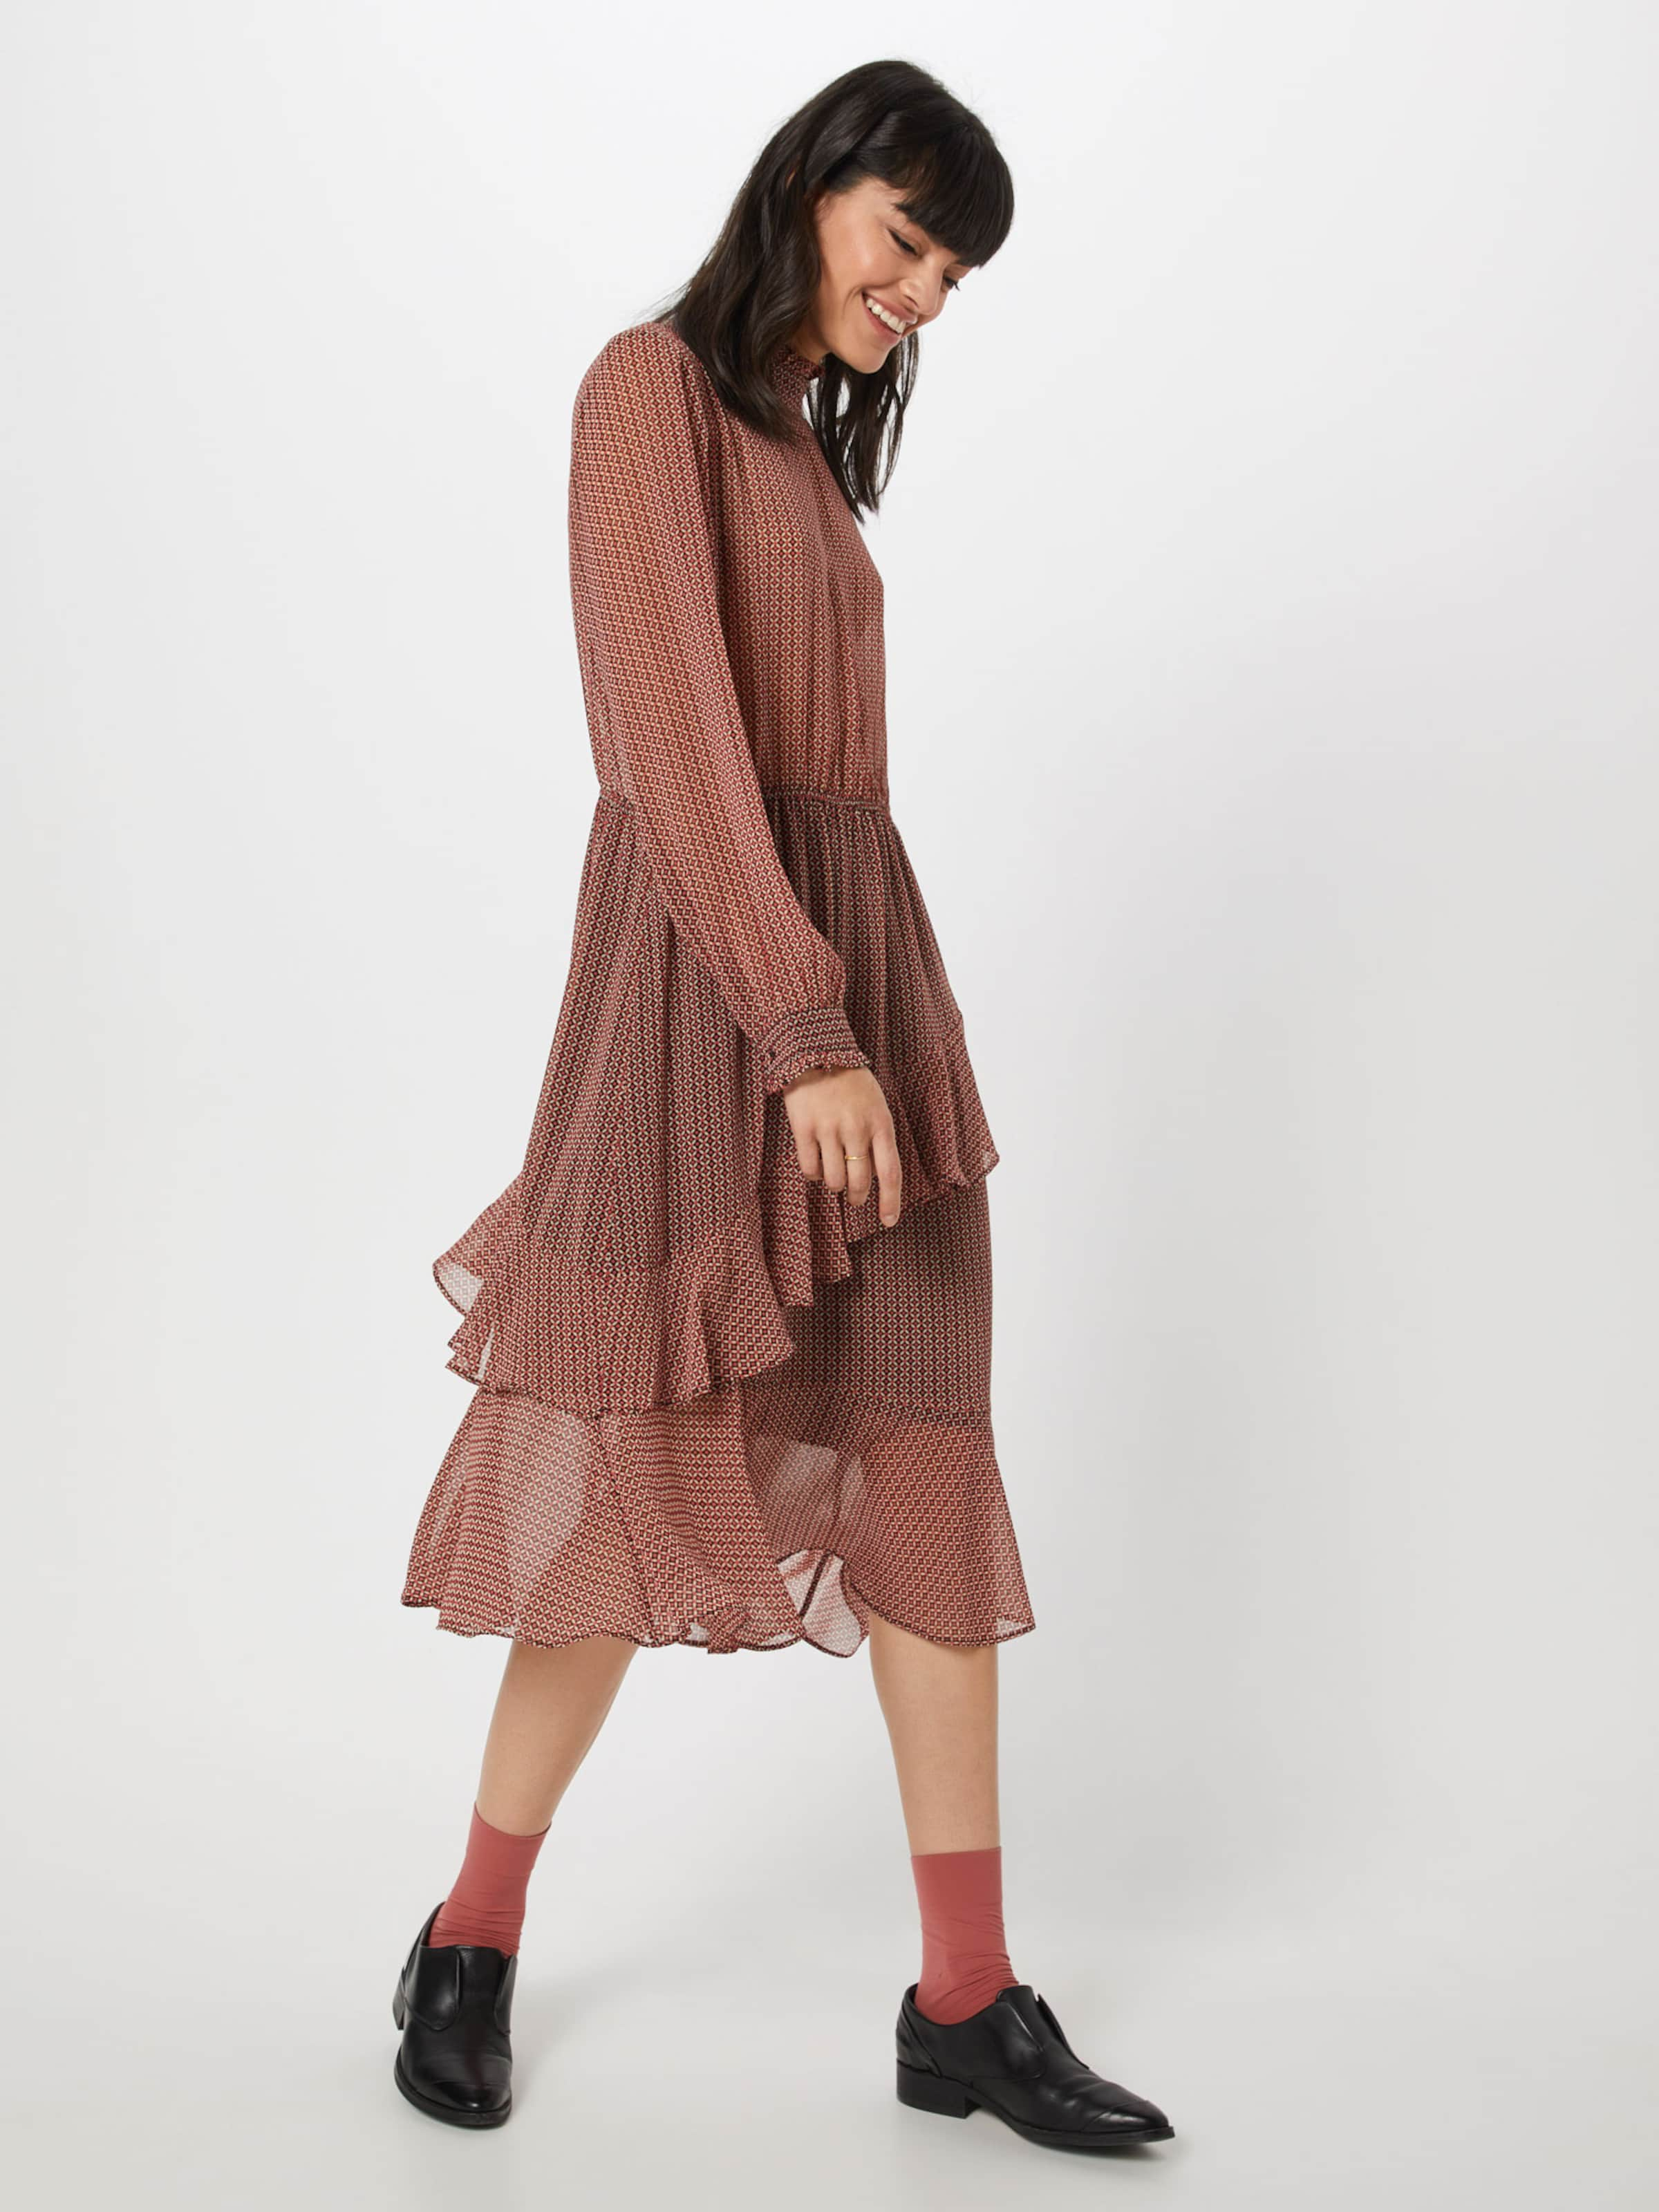 Robe En Female Second Dress' 'leen Rouge Yby7gf6v